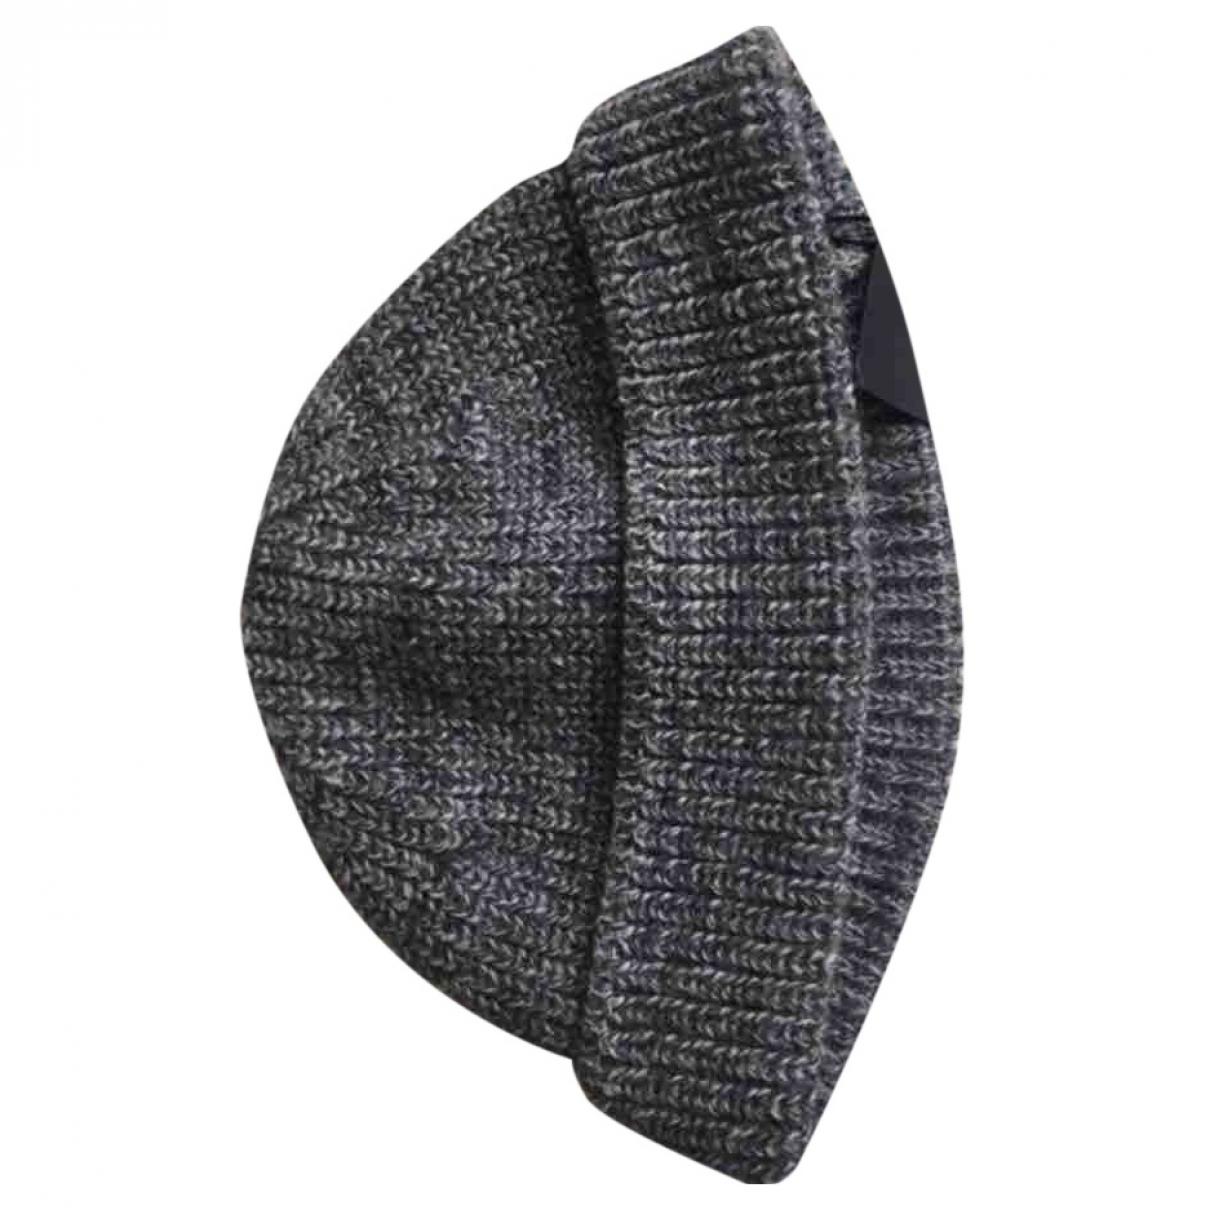 Lanvin \N Anthracite Wool hat & pull on hat for Men M International